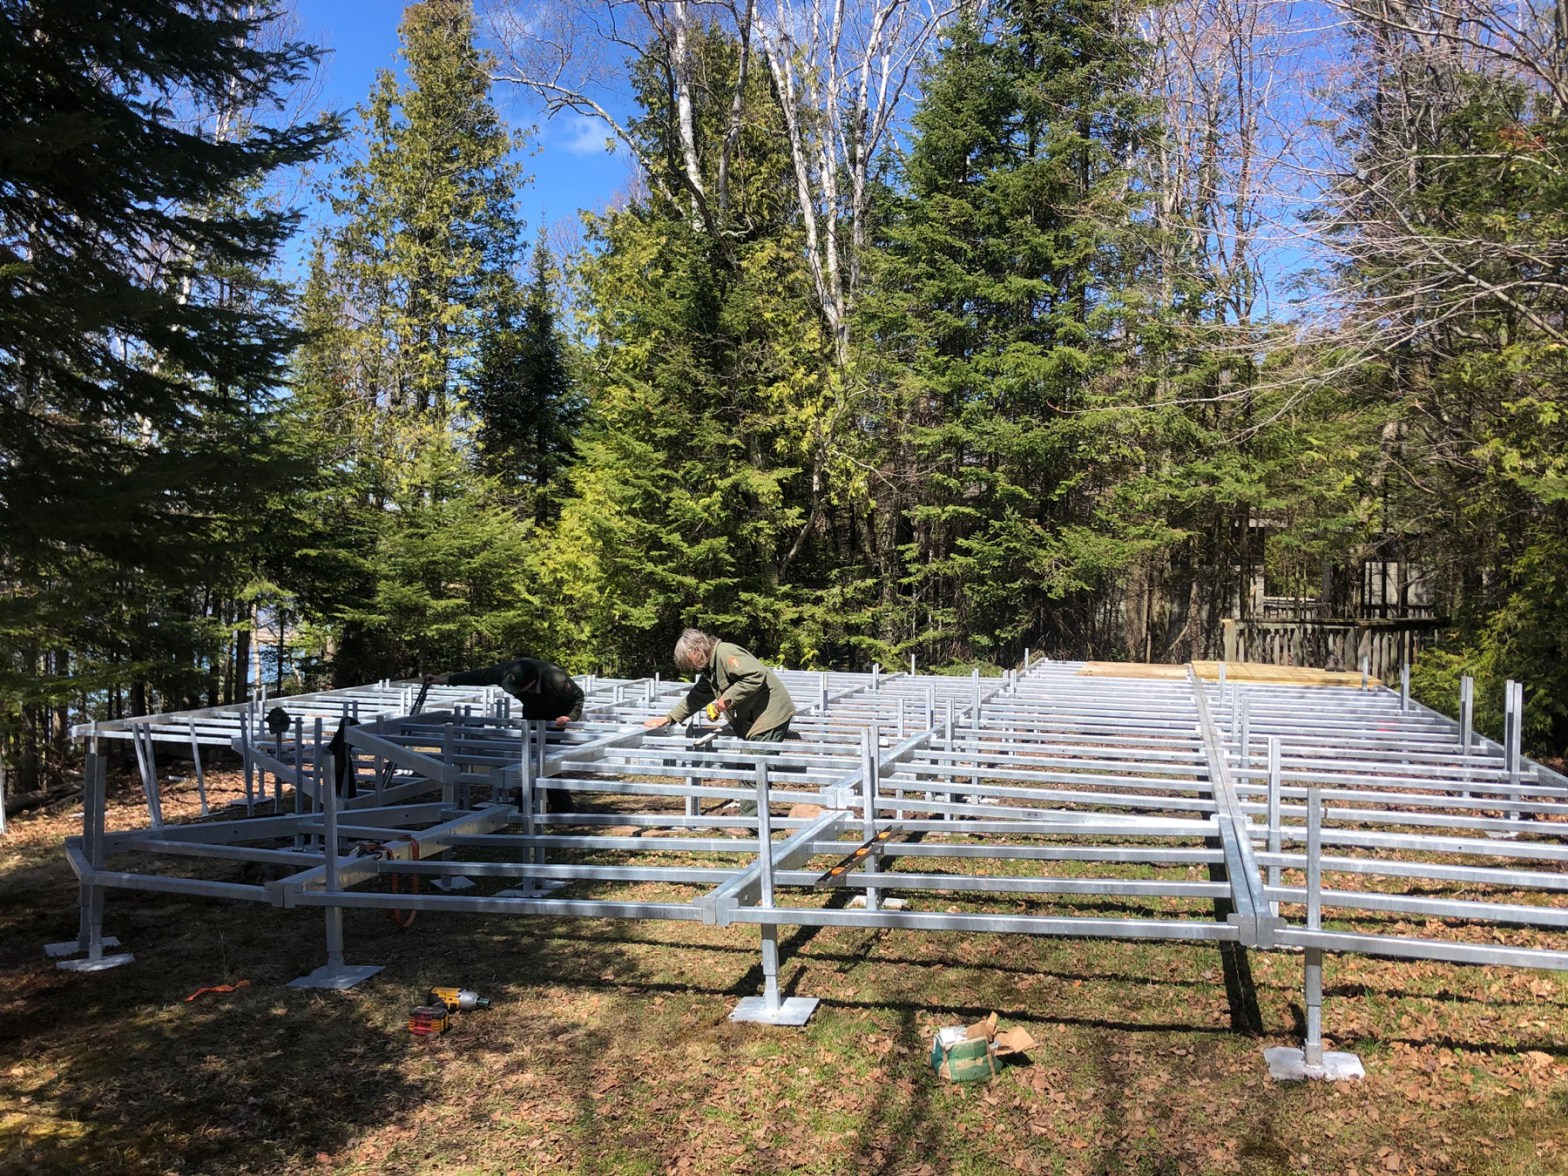 Amphitheater under construction